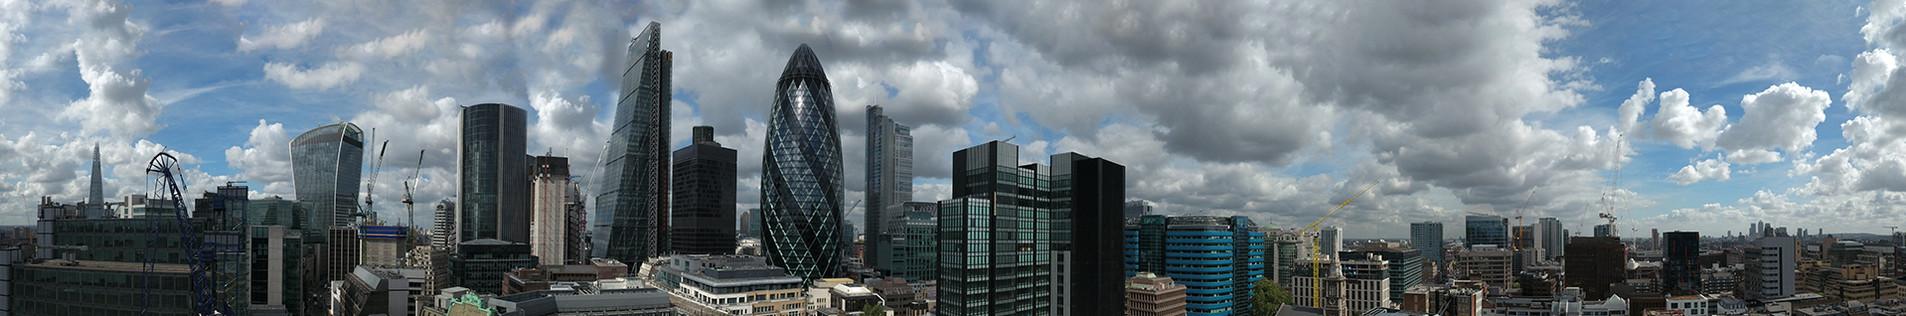 London Pano1.jpg